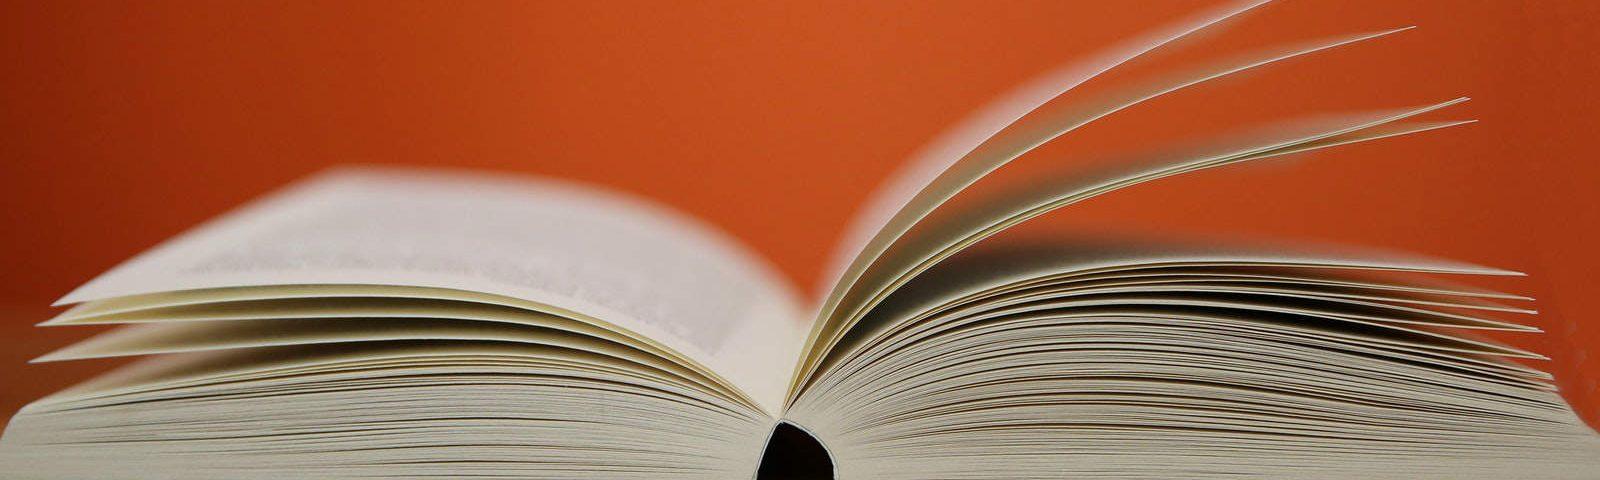 Knjiga, slika: https://www.pexels.com